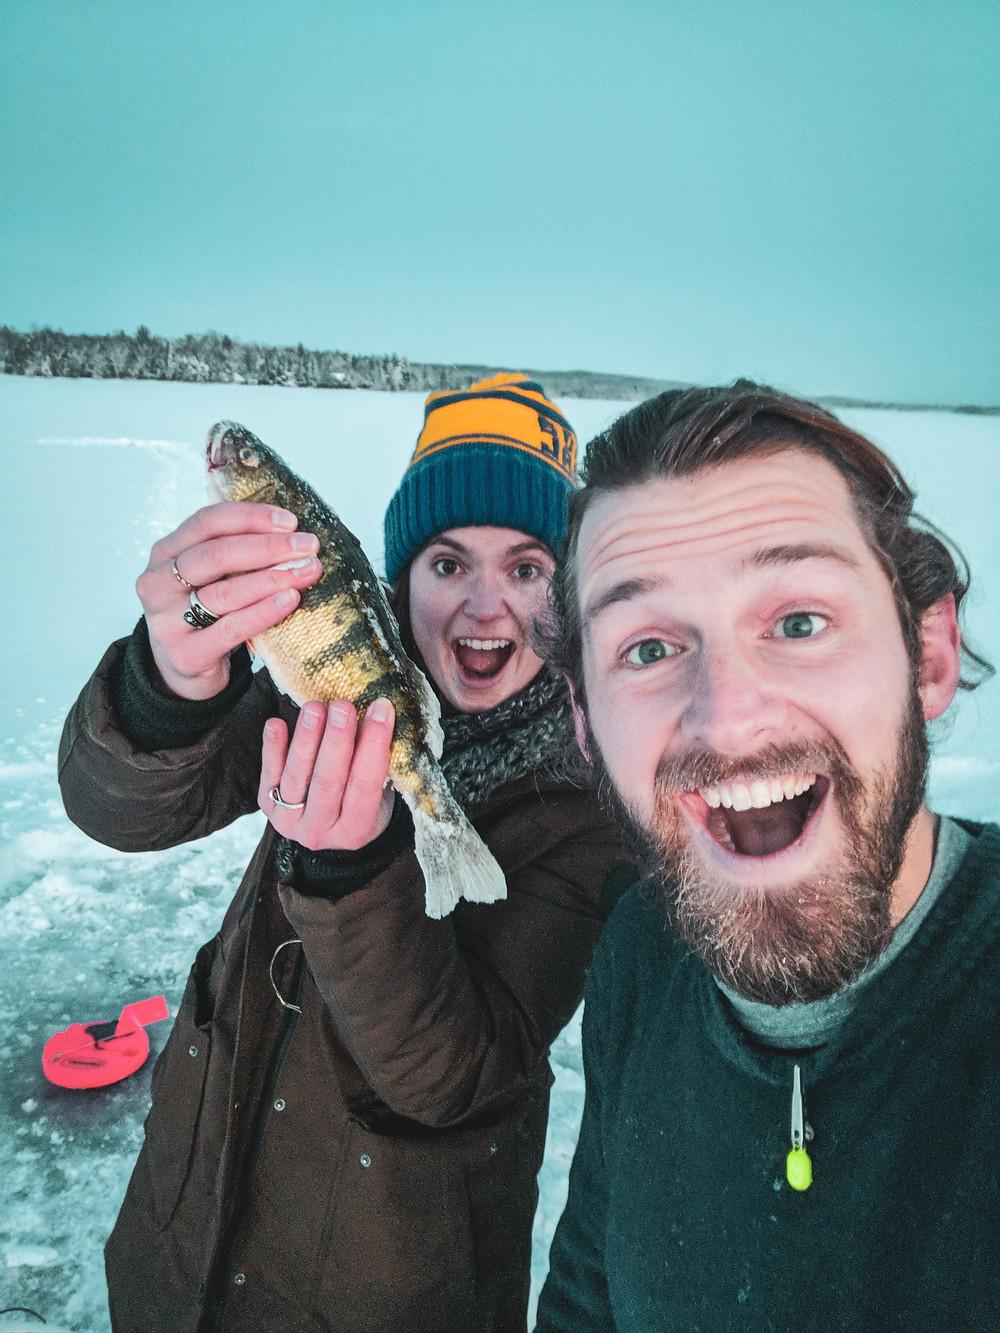 Ice fishing on Pickerel Lake in Northern  Michigan